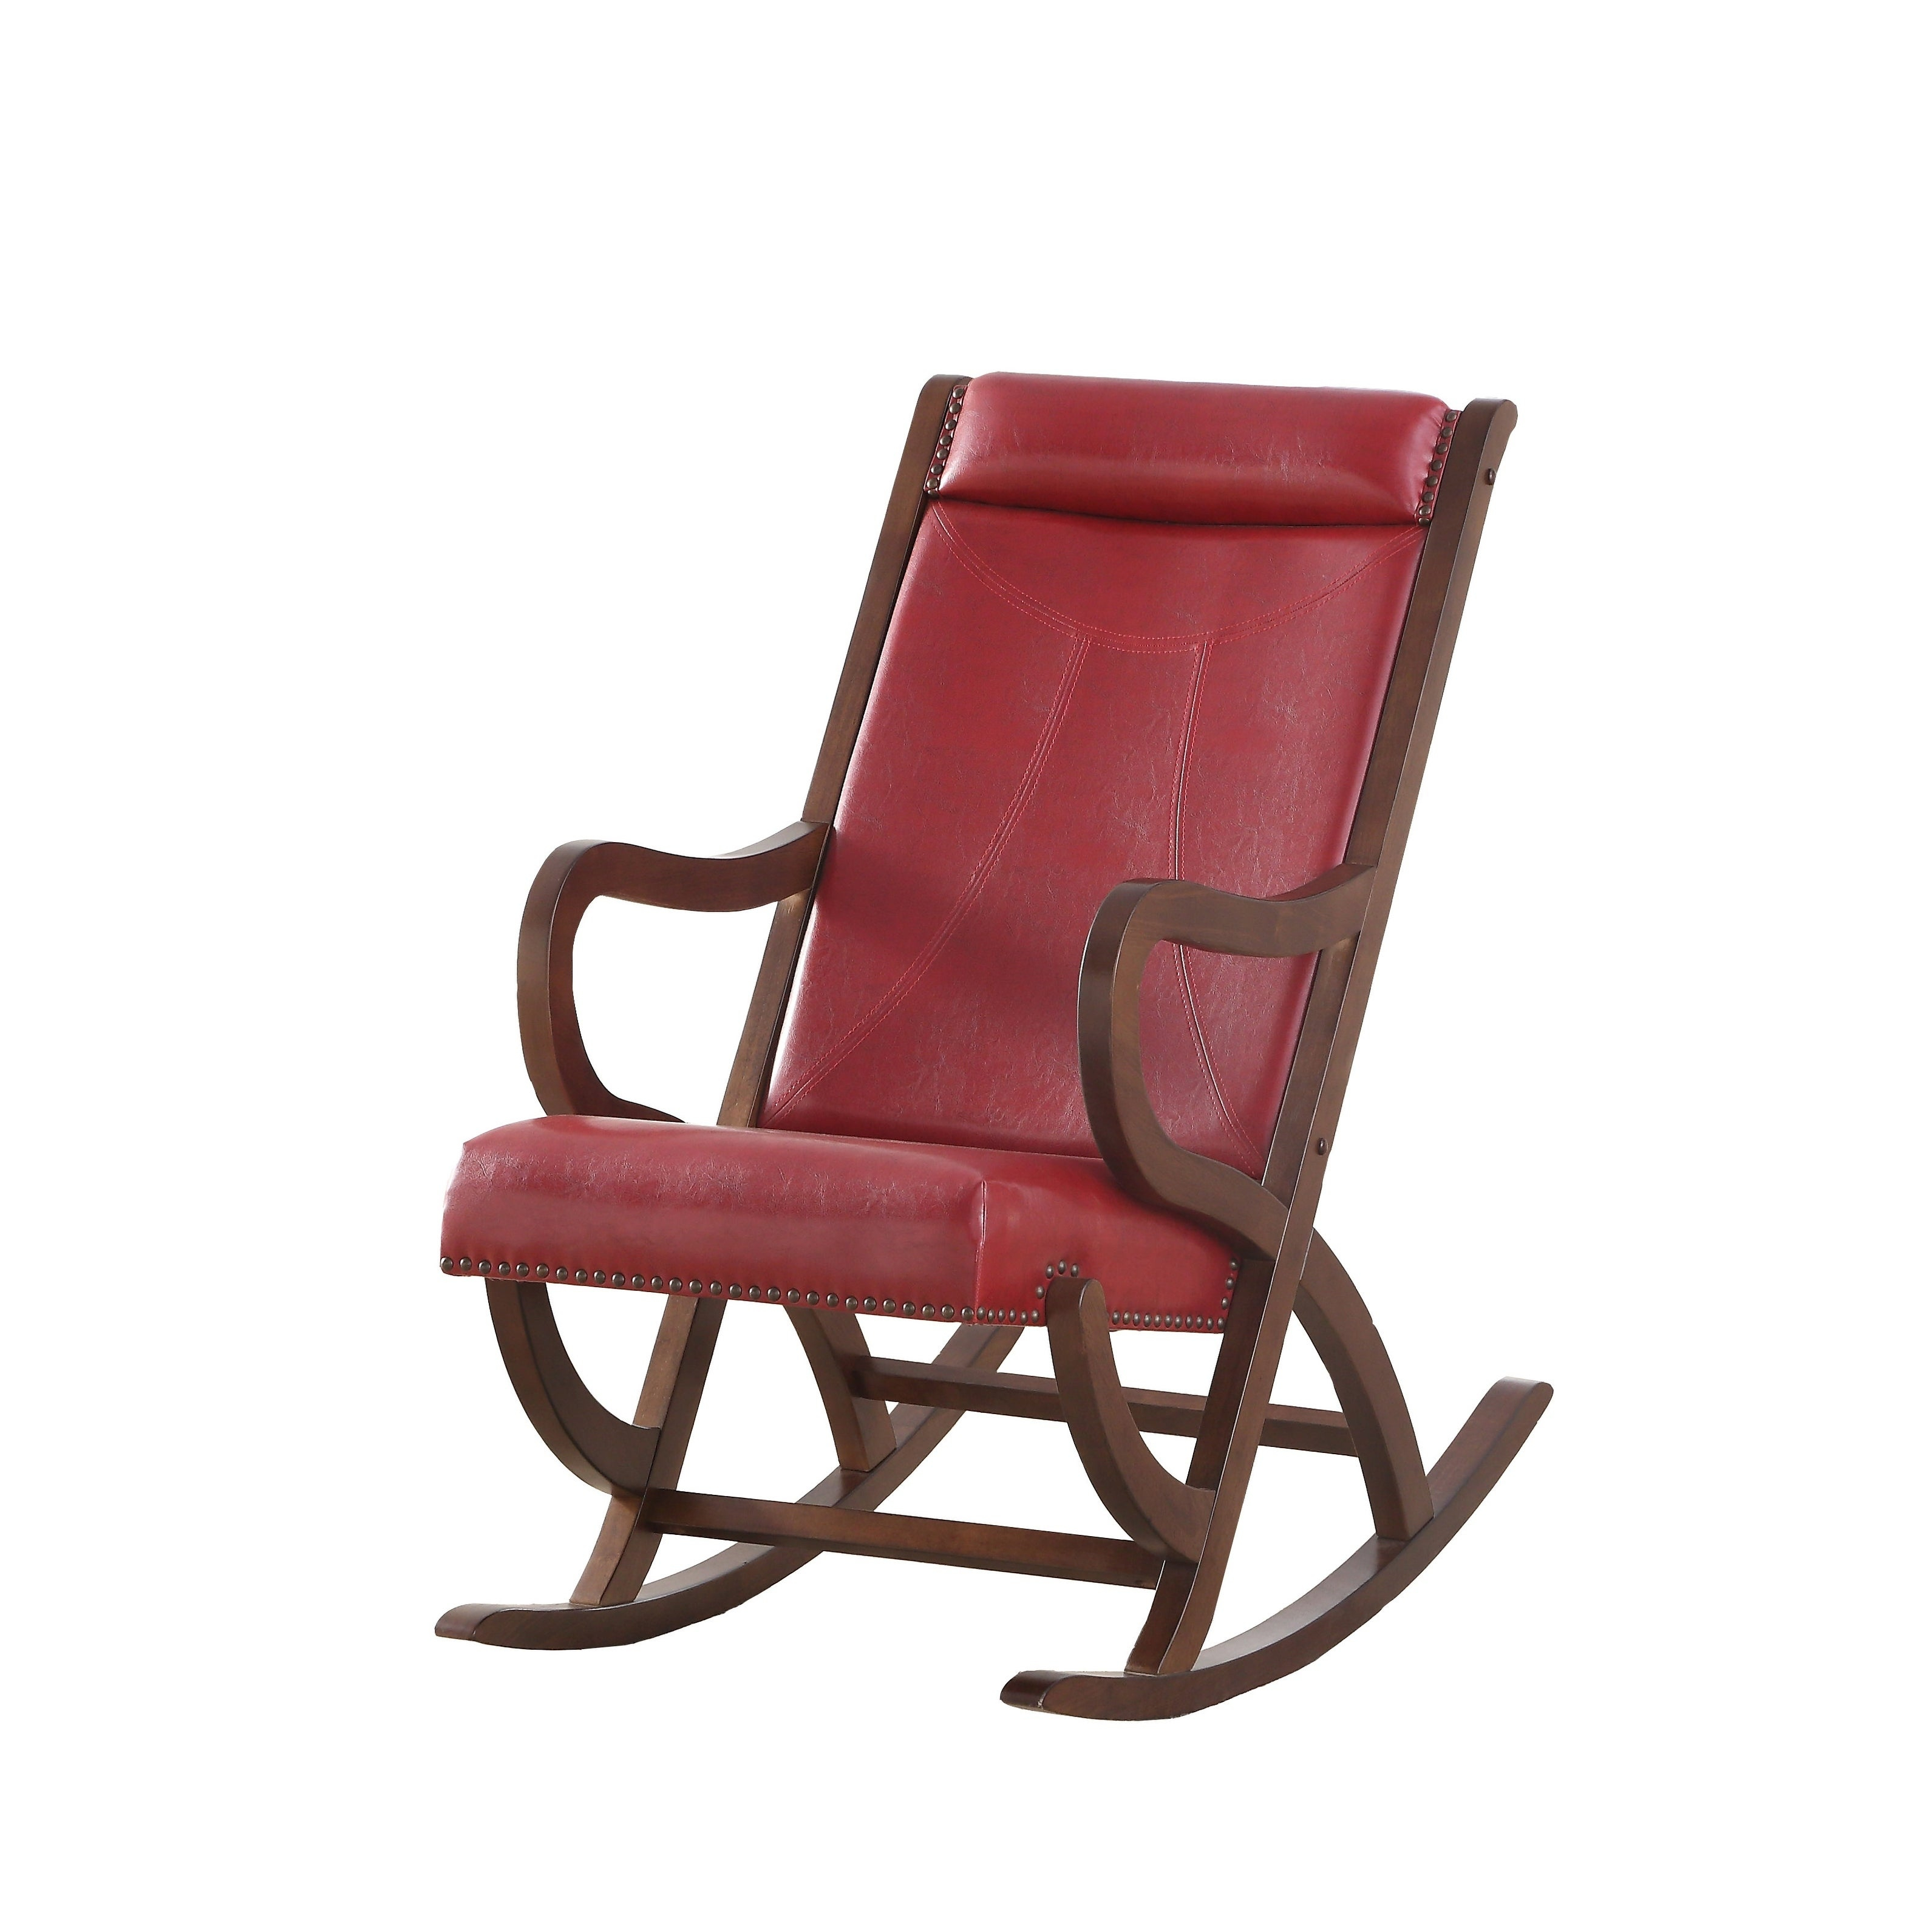 Carbon Loft Ariel Rocking Chair In Burgundy Pu And Walnut Within Carbon Loft Ariel Rocking Chairs In Espresso Pu And Walnut (View 2 of 20)